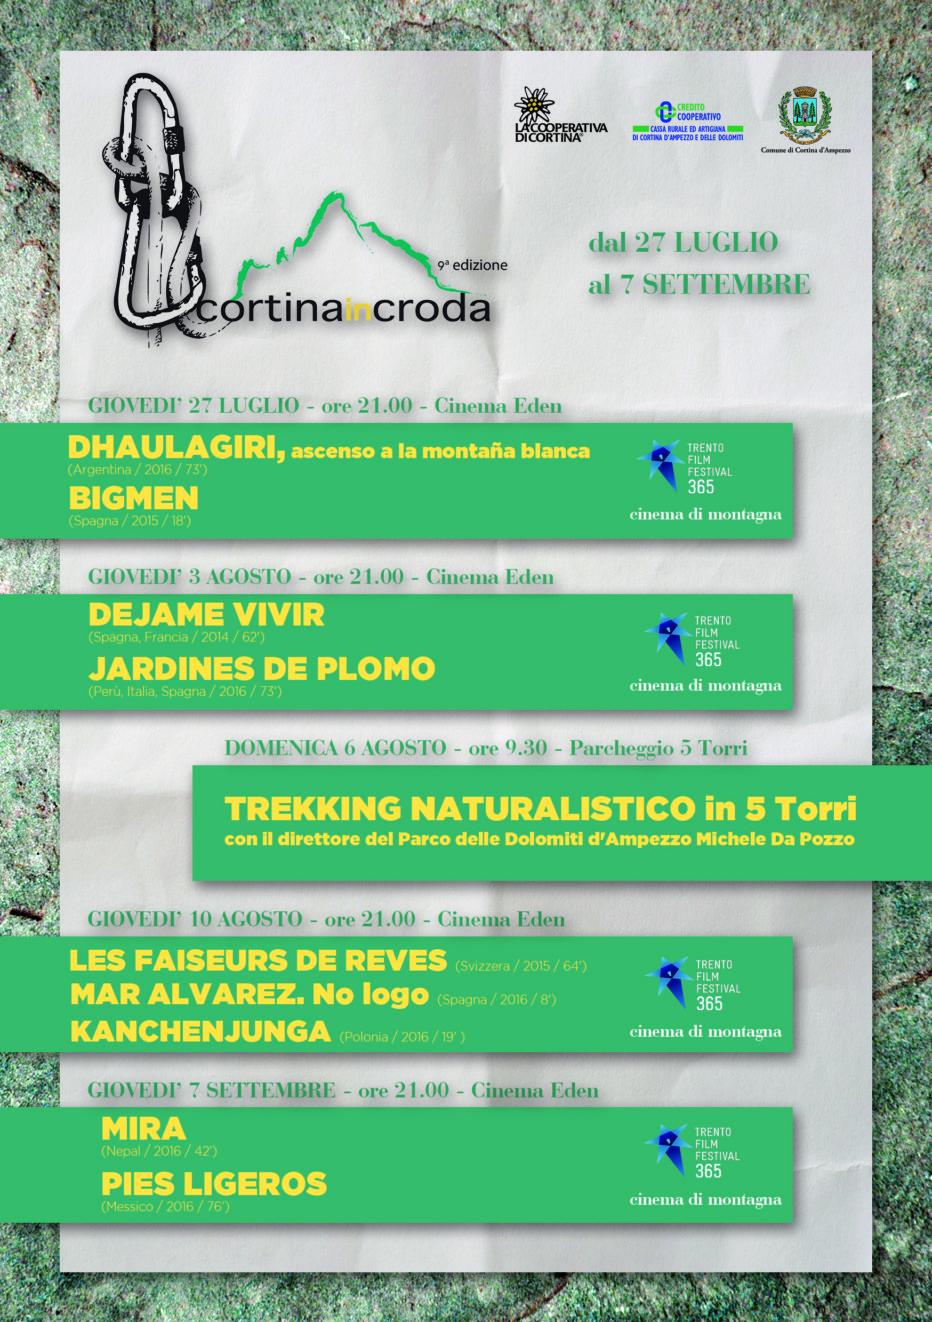 Cortina InCroda 2017: cinema di montagna e trekking.